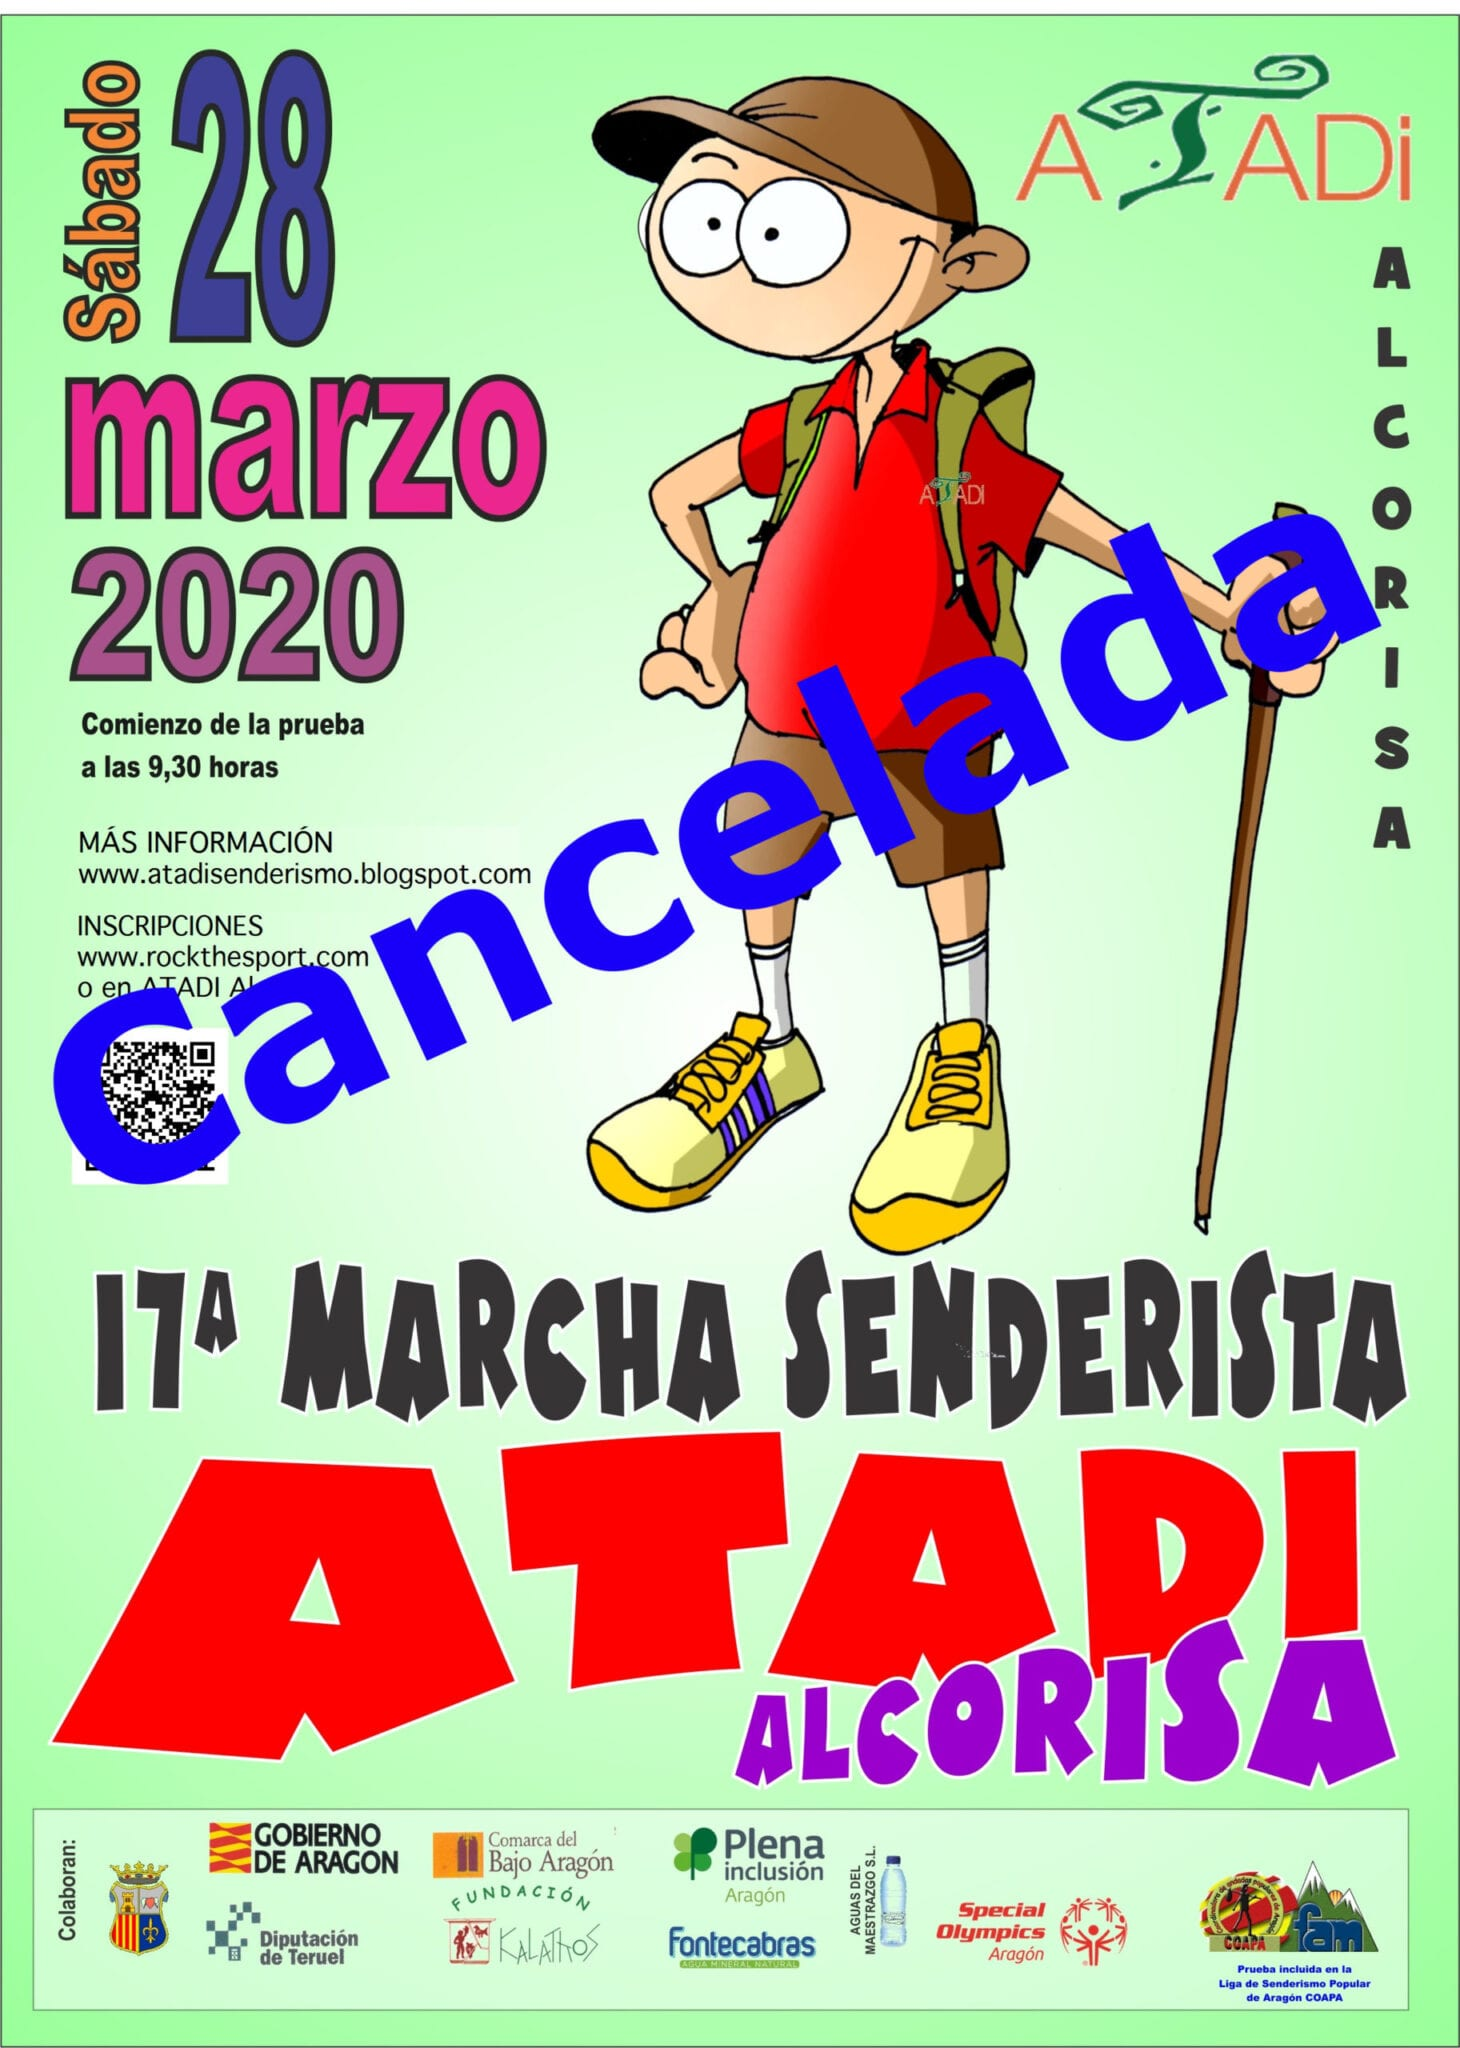 Se suspende la Marcha Senderista ATADI Alcorisa